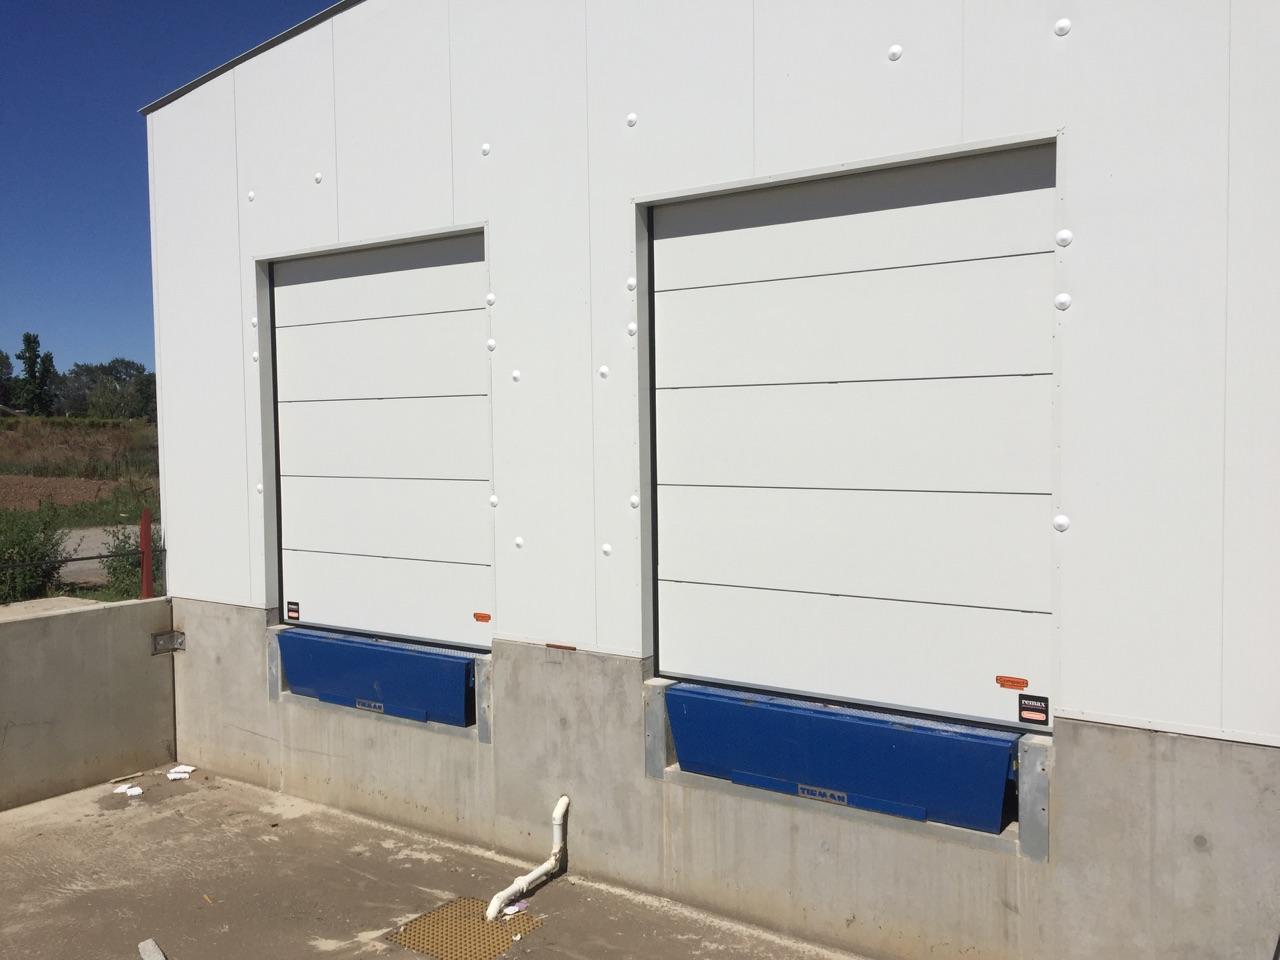 Thermal compact doors